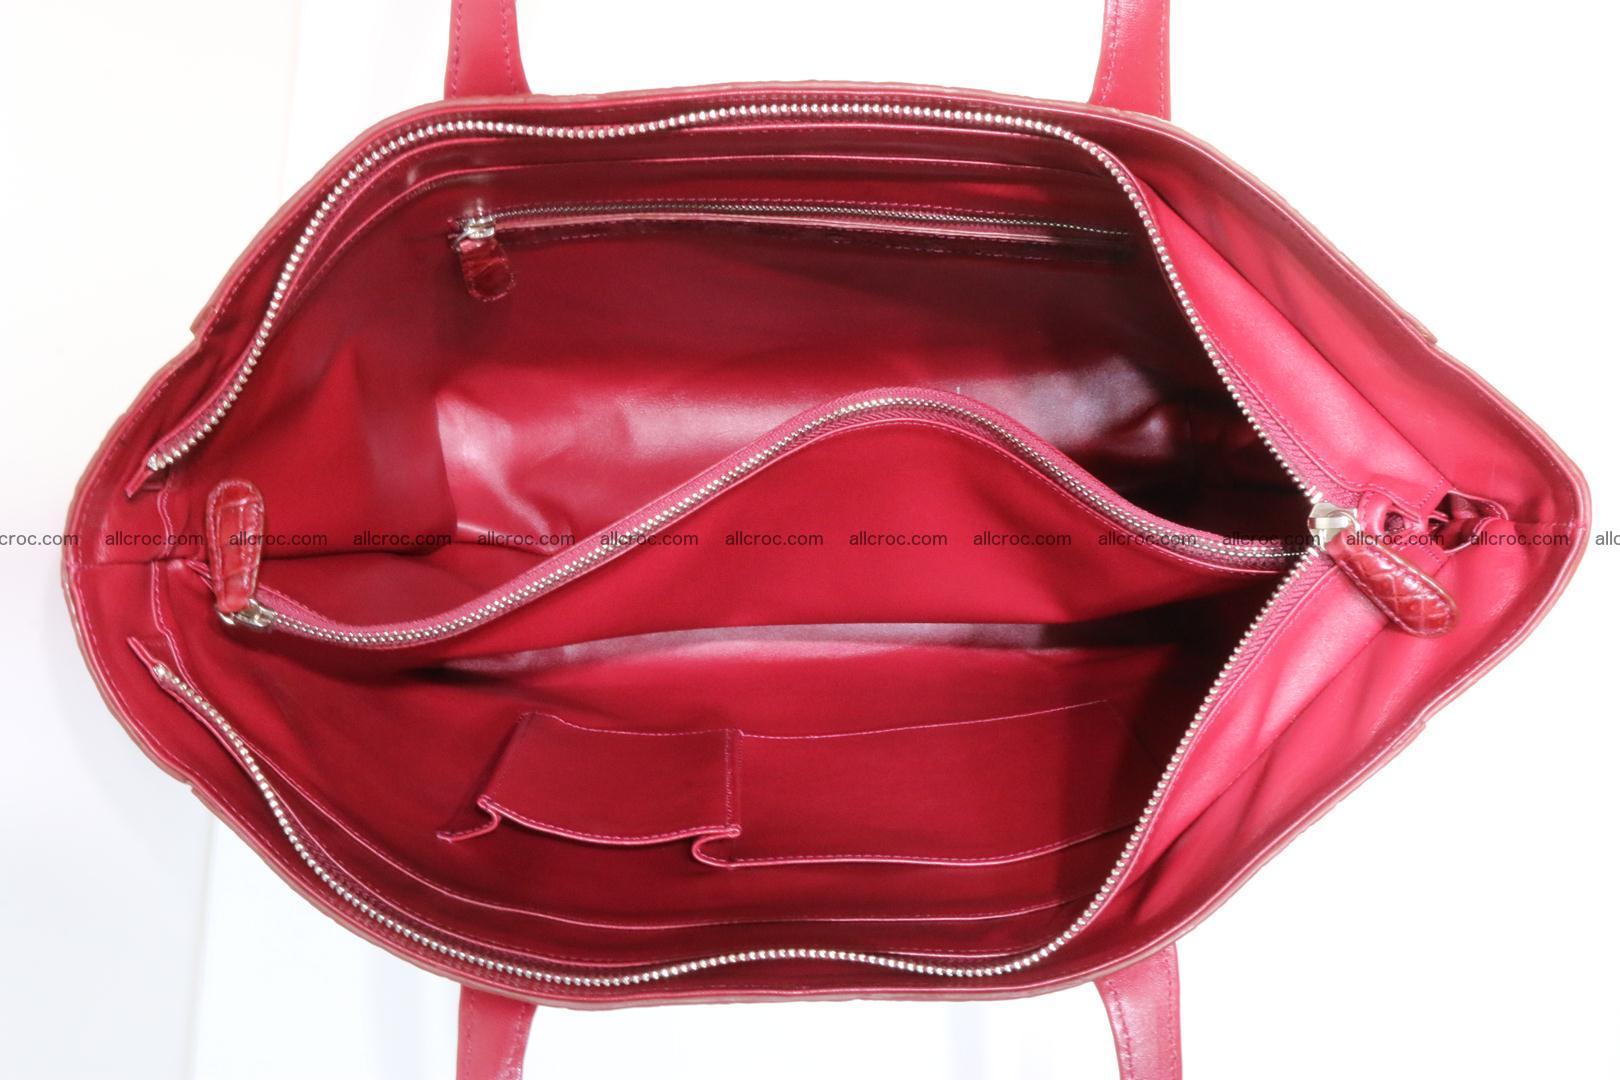 Genuine crocodile leather women's bag 063 Foto 12